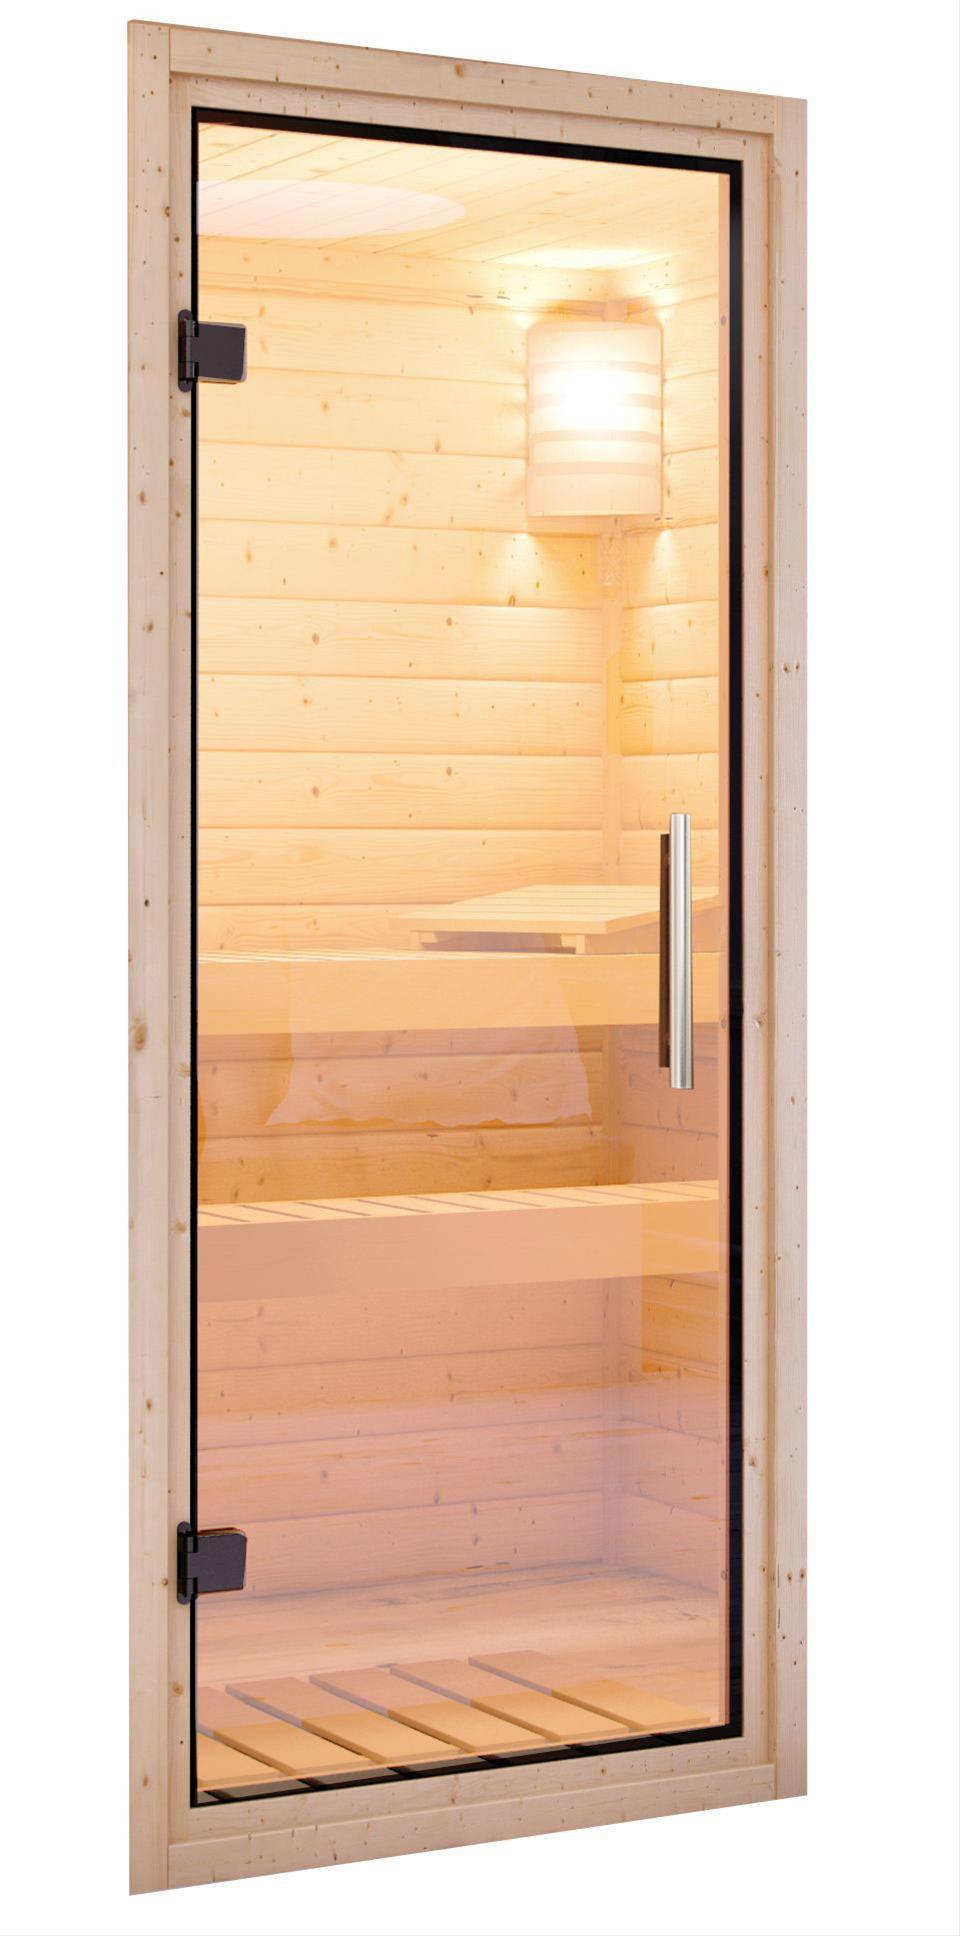 WoodFeeling Sauna Svea 38mm mit Saunaofen 9 kW extern Klarglas Tür Bild 6